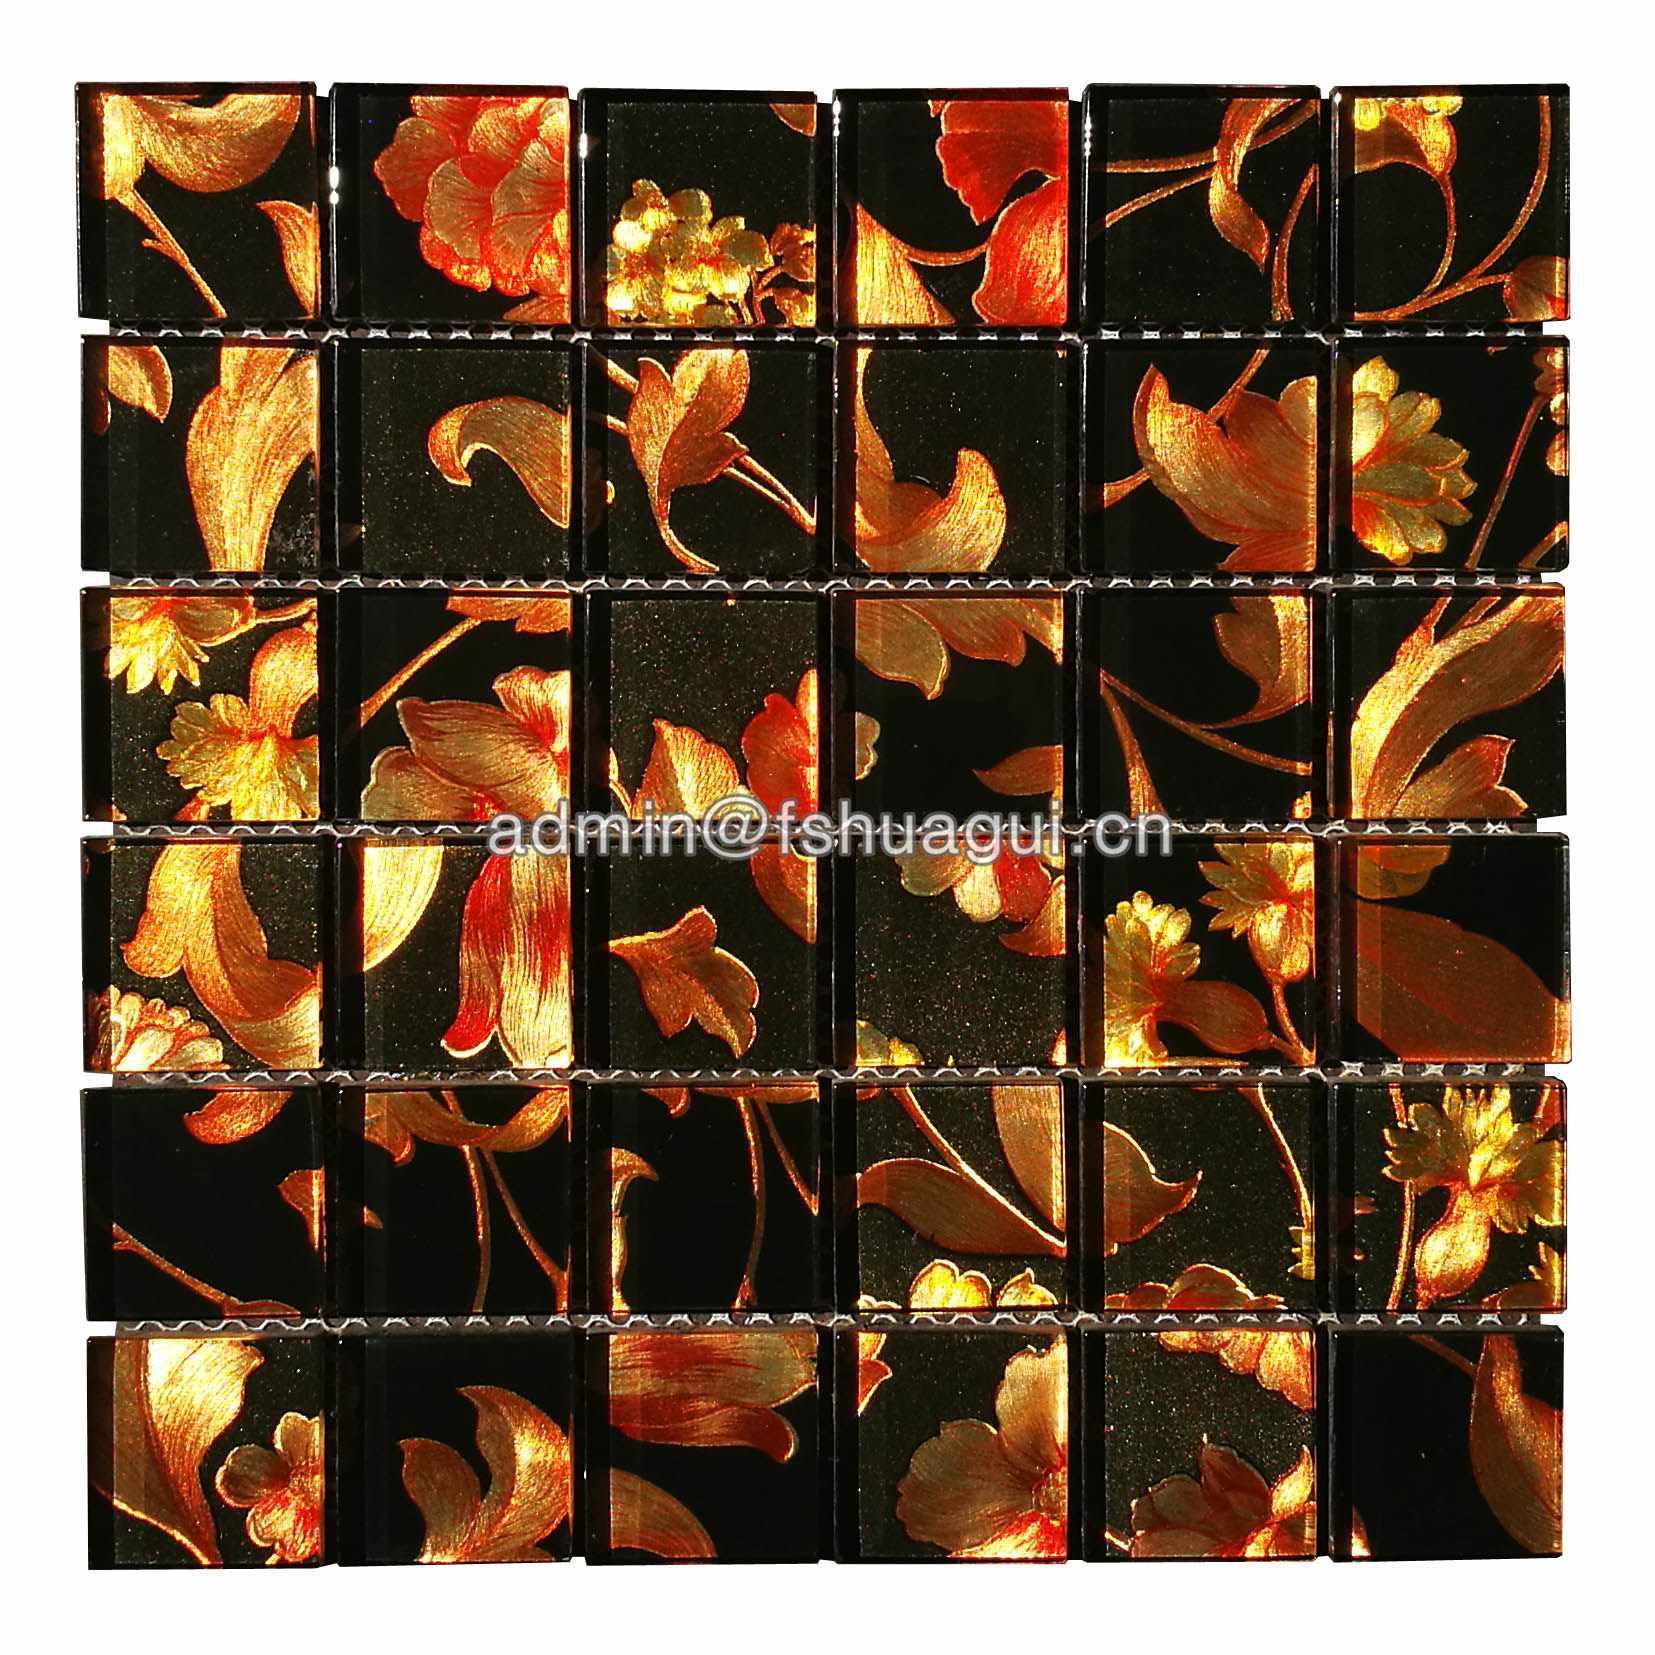 Huagui Glass mosaic tile black and gold crystal backsplash plated mosaic wall tile desgin GLASS MOSAIC TILE image111